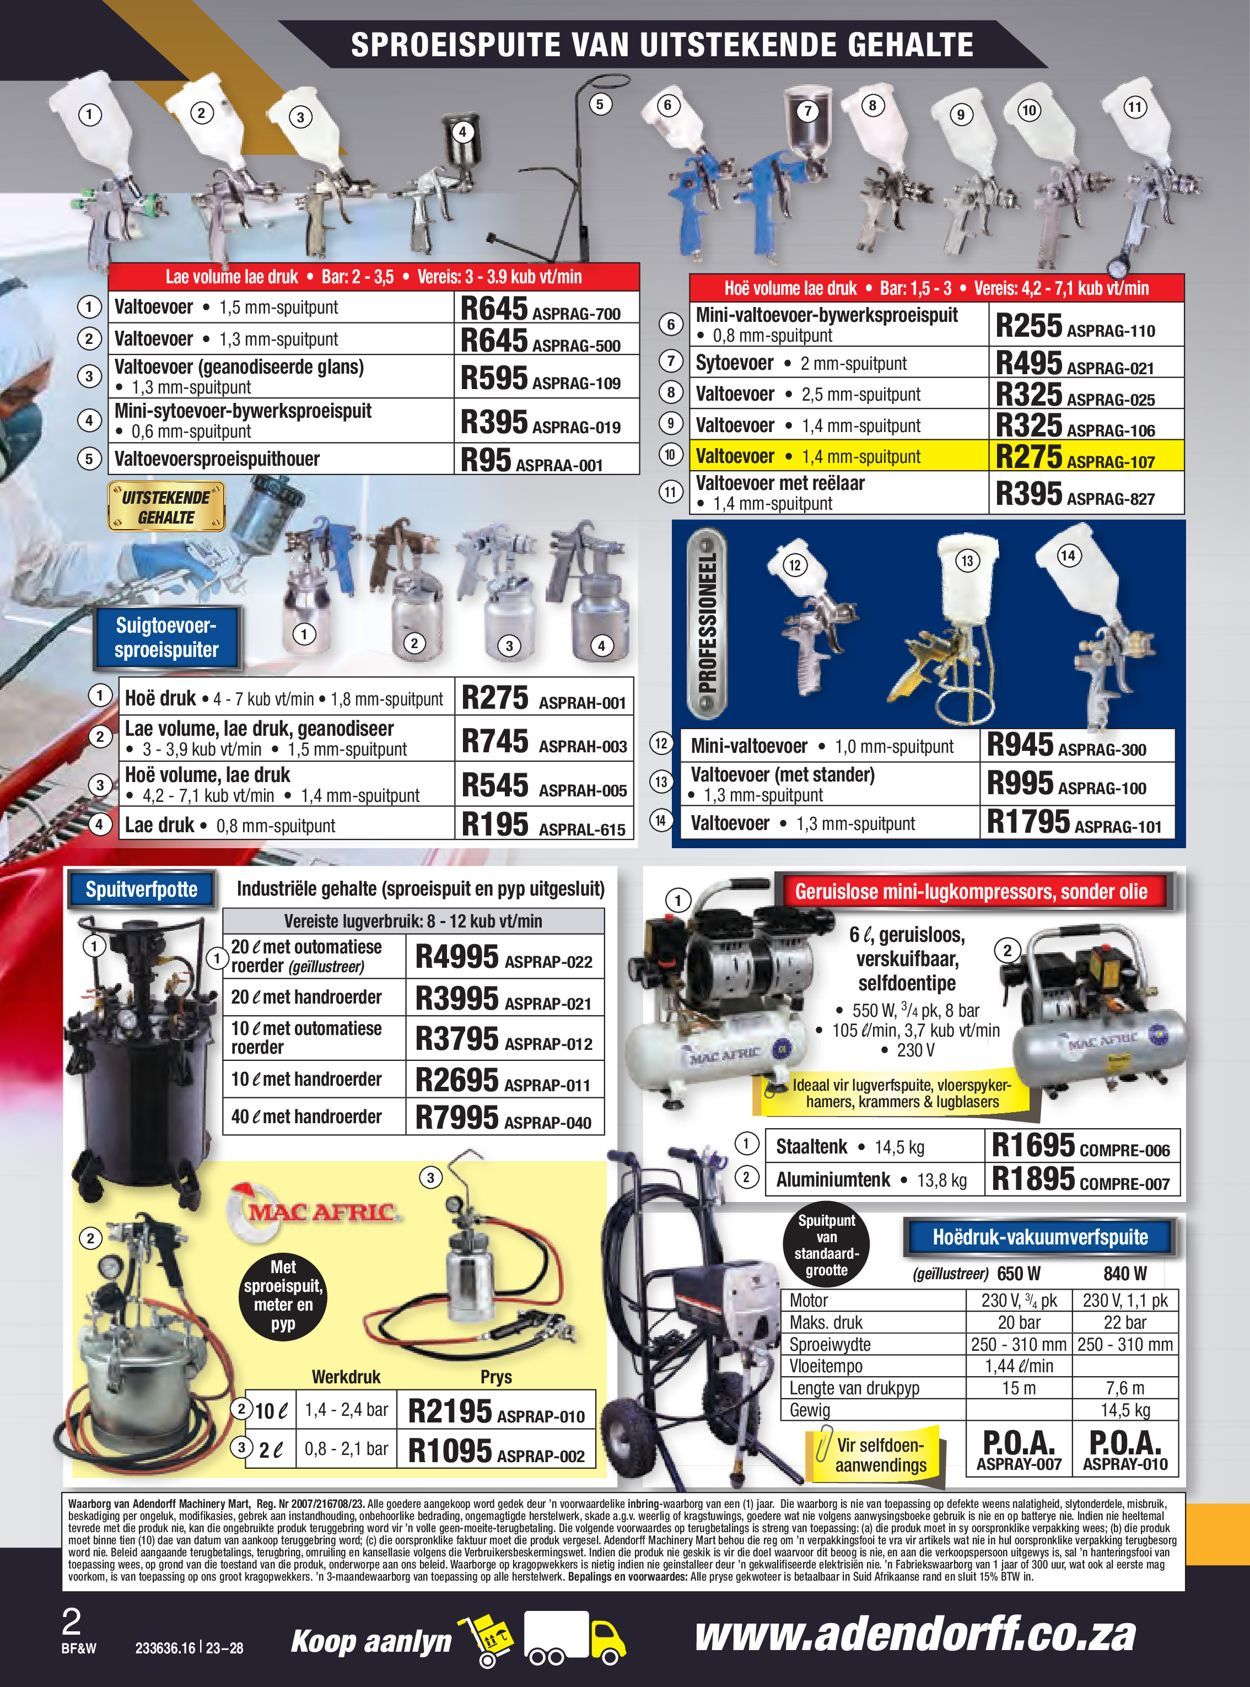 Adendorff Machinery Mart Black Friday 2020 Catalogue - 2020/11/23-2020/11/28 (Page 3)